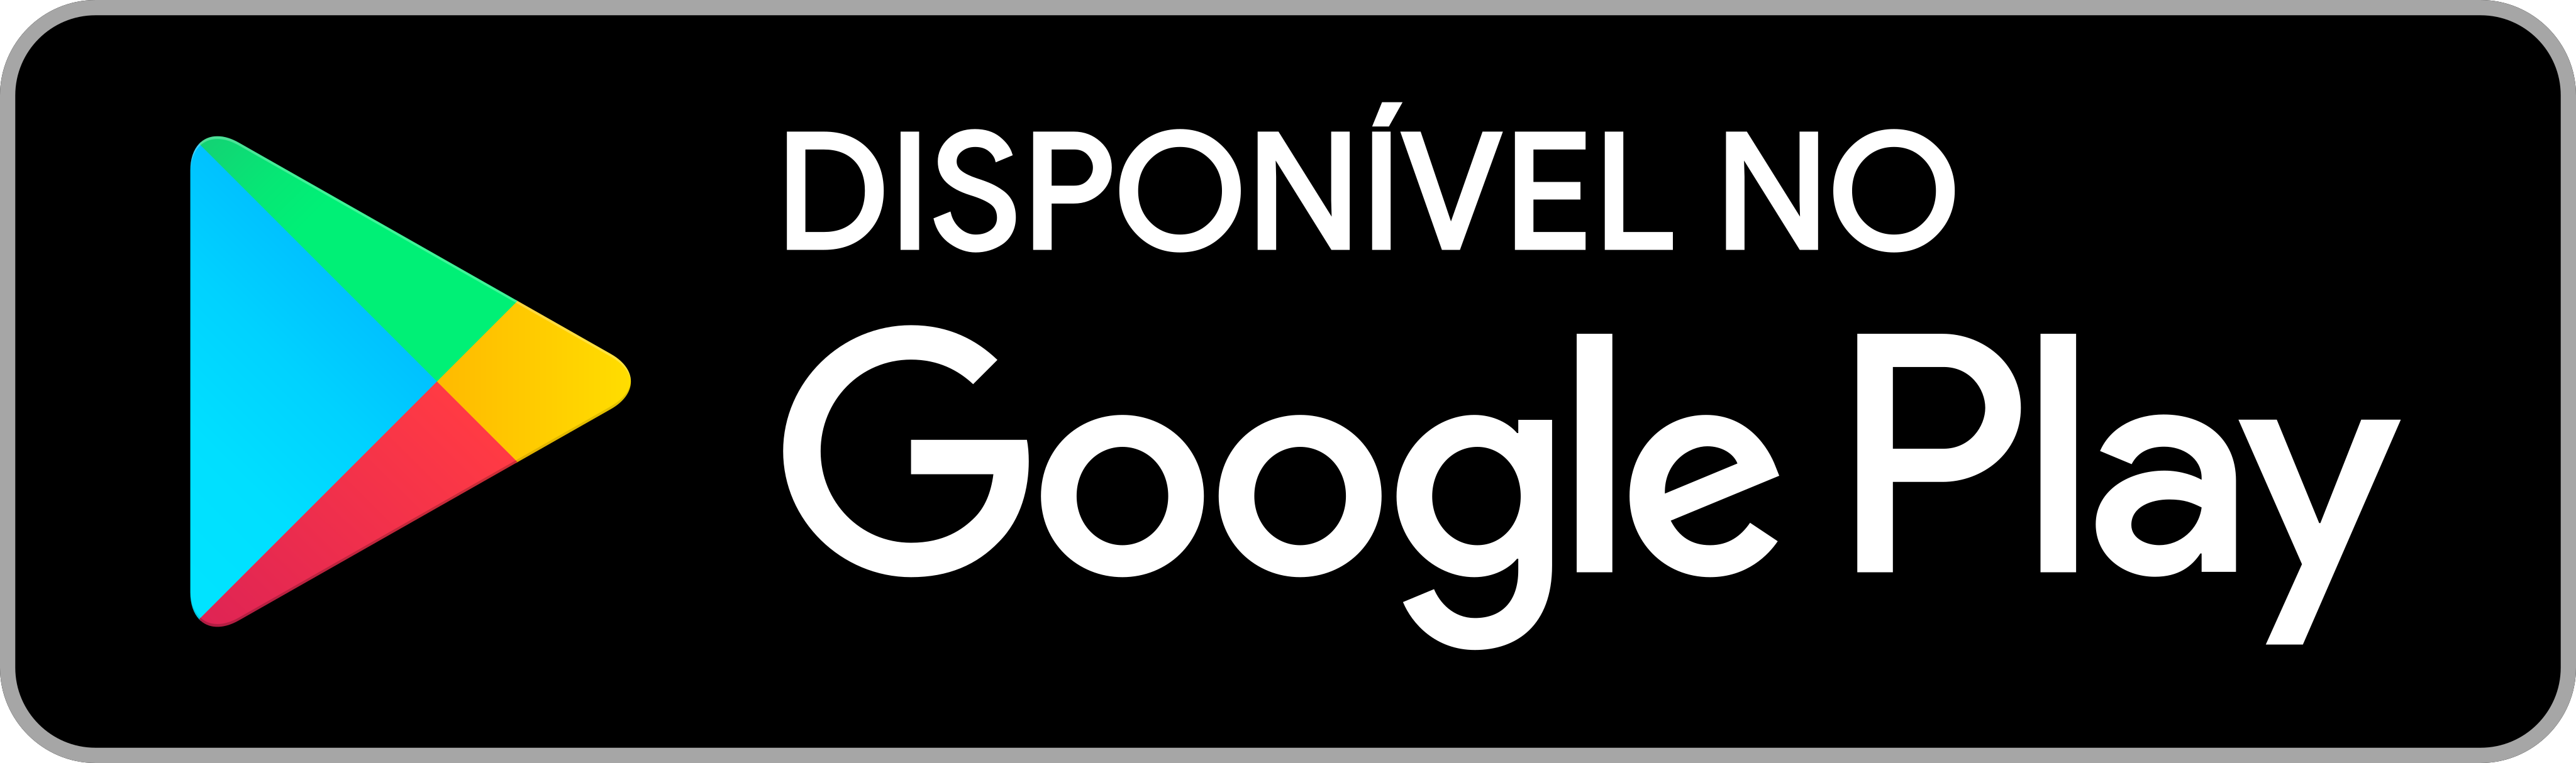 Disponivel google play